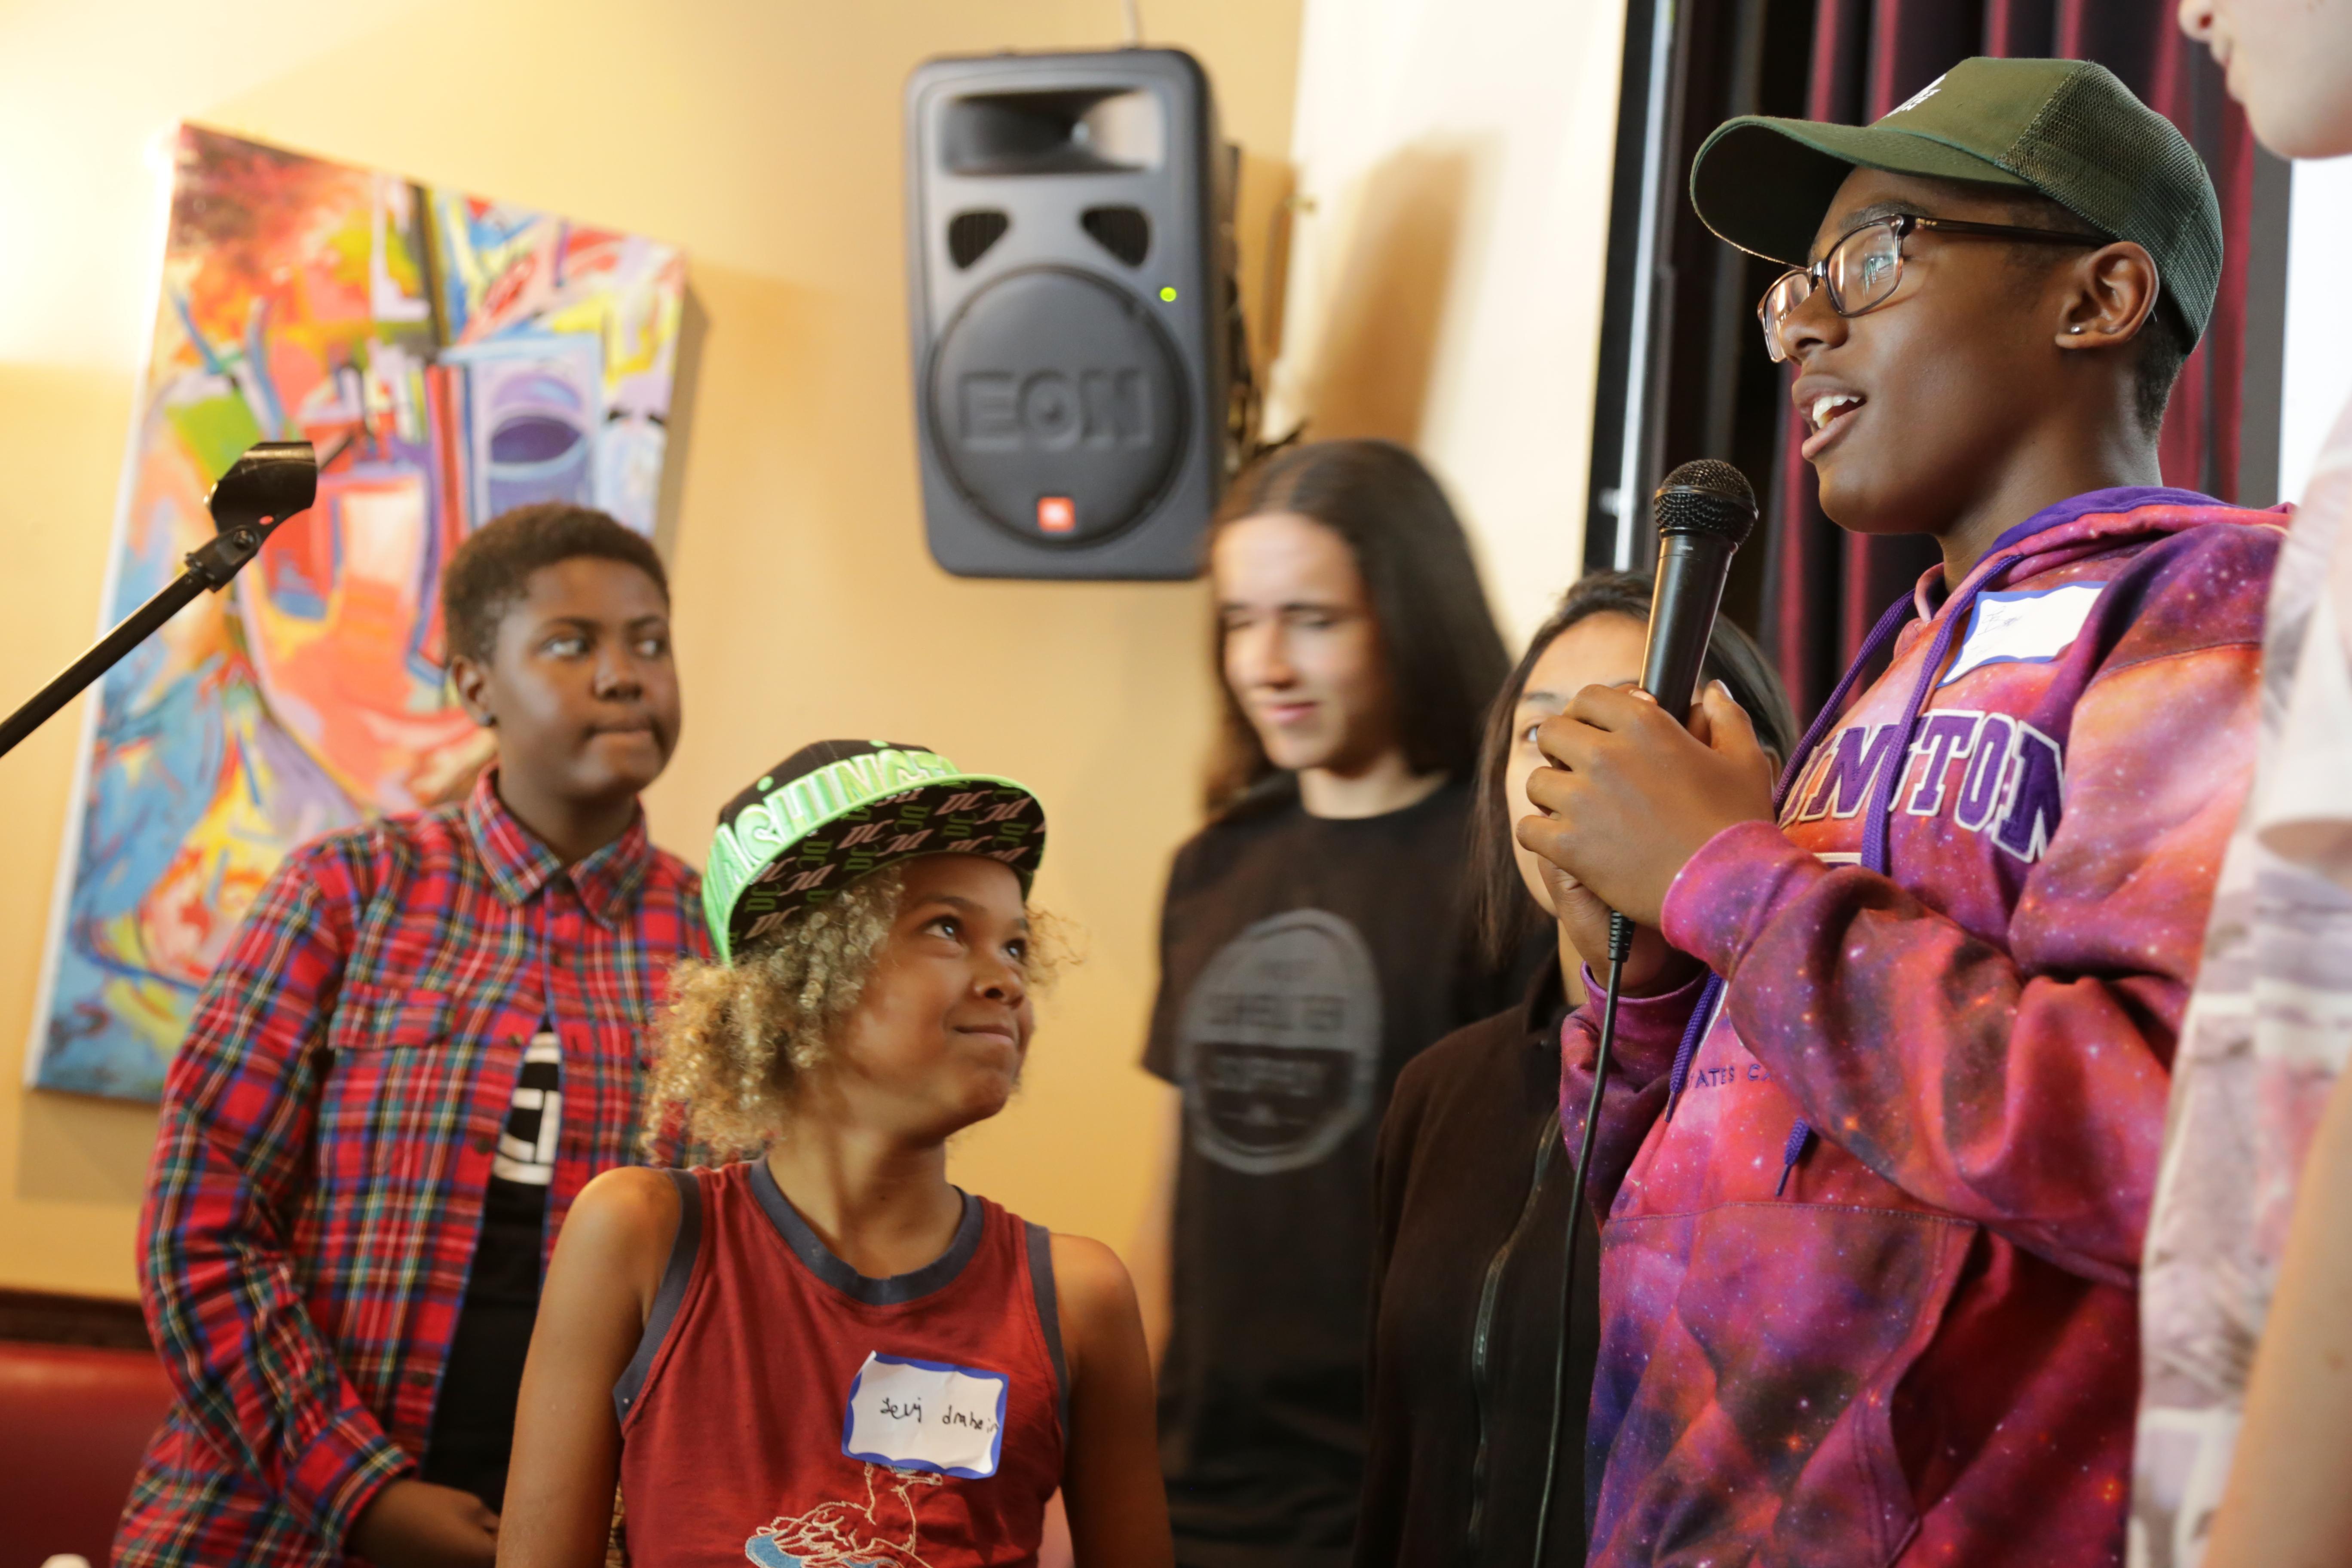 Plaintiff Levi Draheim (age 9) listens as Isaac Vergun (15) speaks during a presentation at Busboys and Poets, a restaurant in Washington, DC. (Photo by John Light)